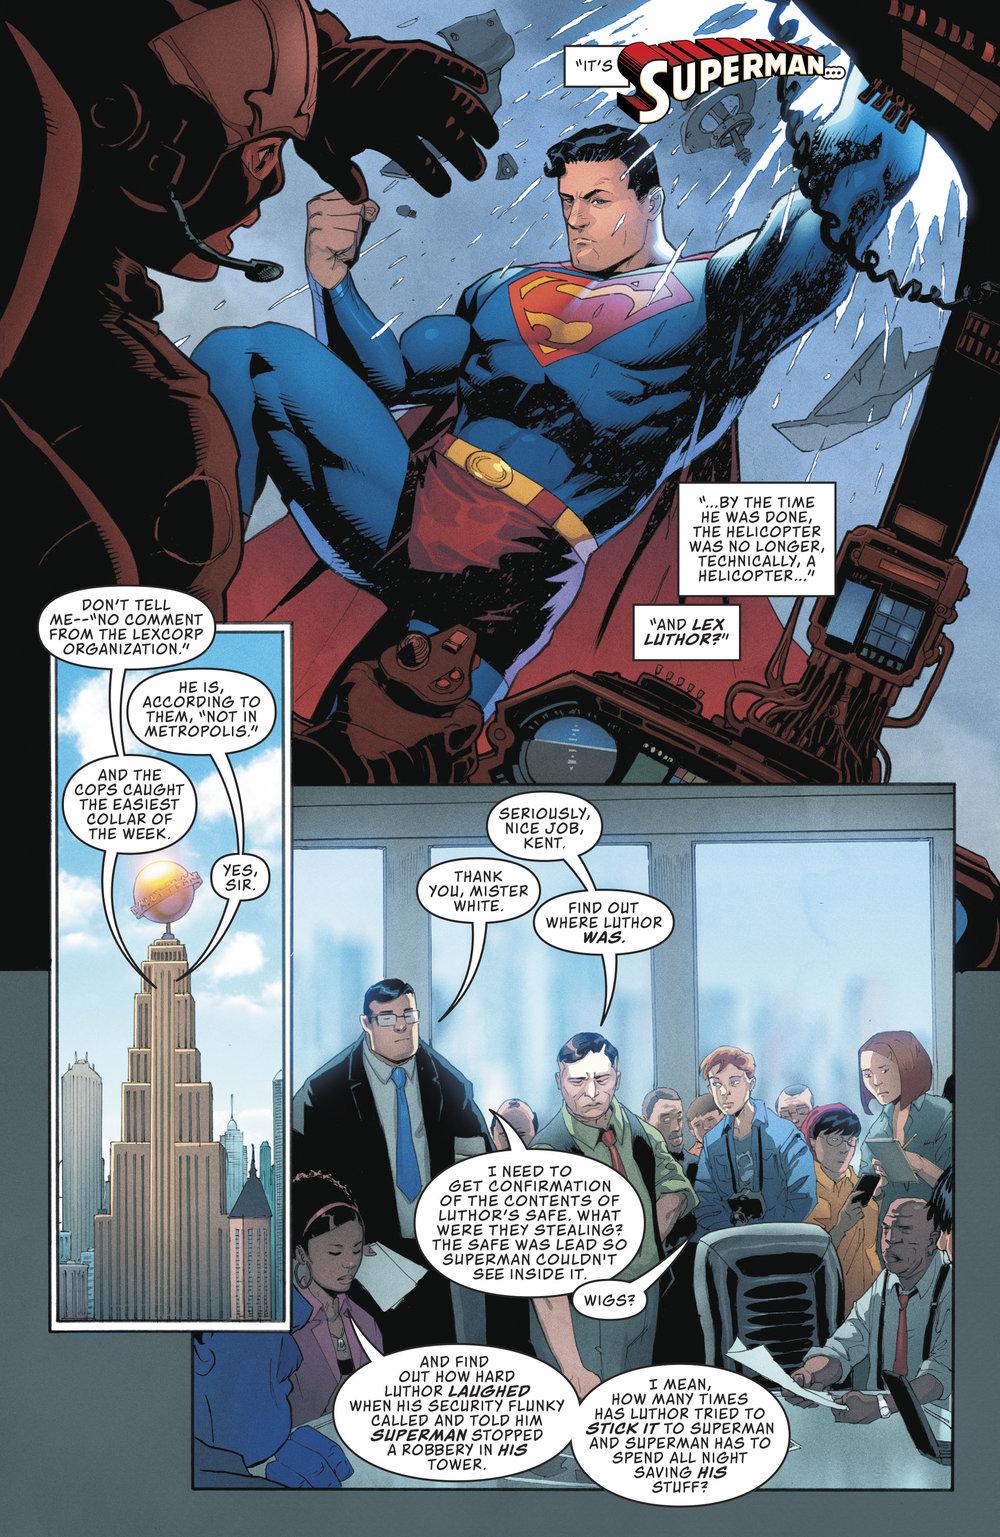 Action Comics 1001 3.jpg